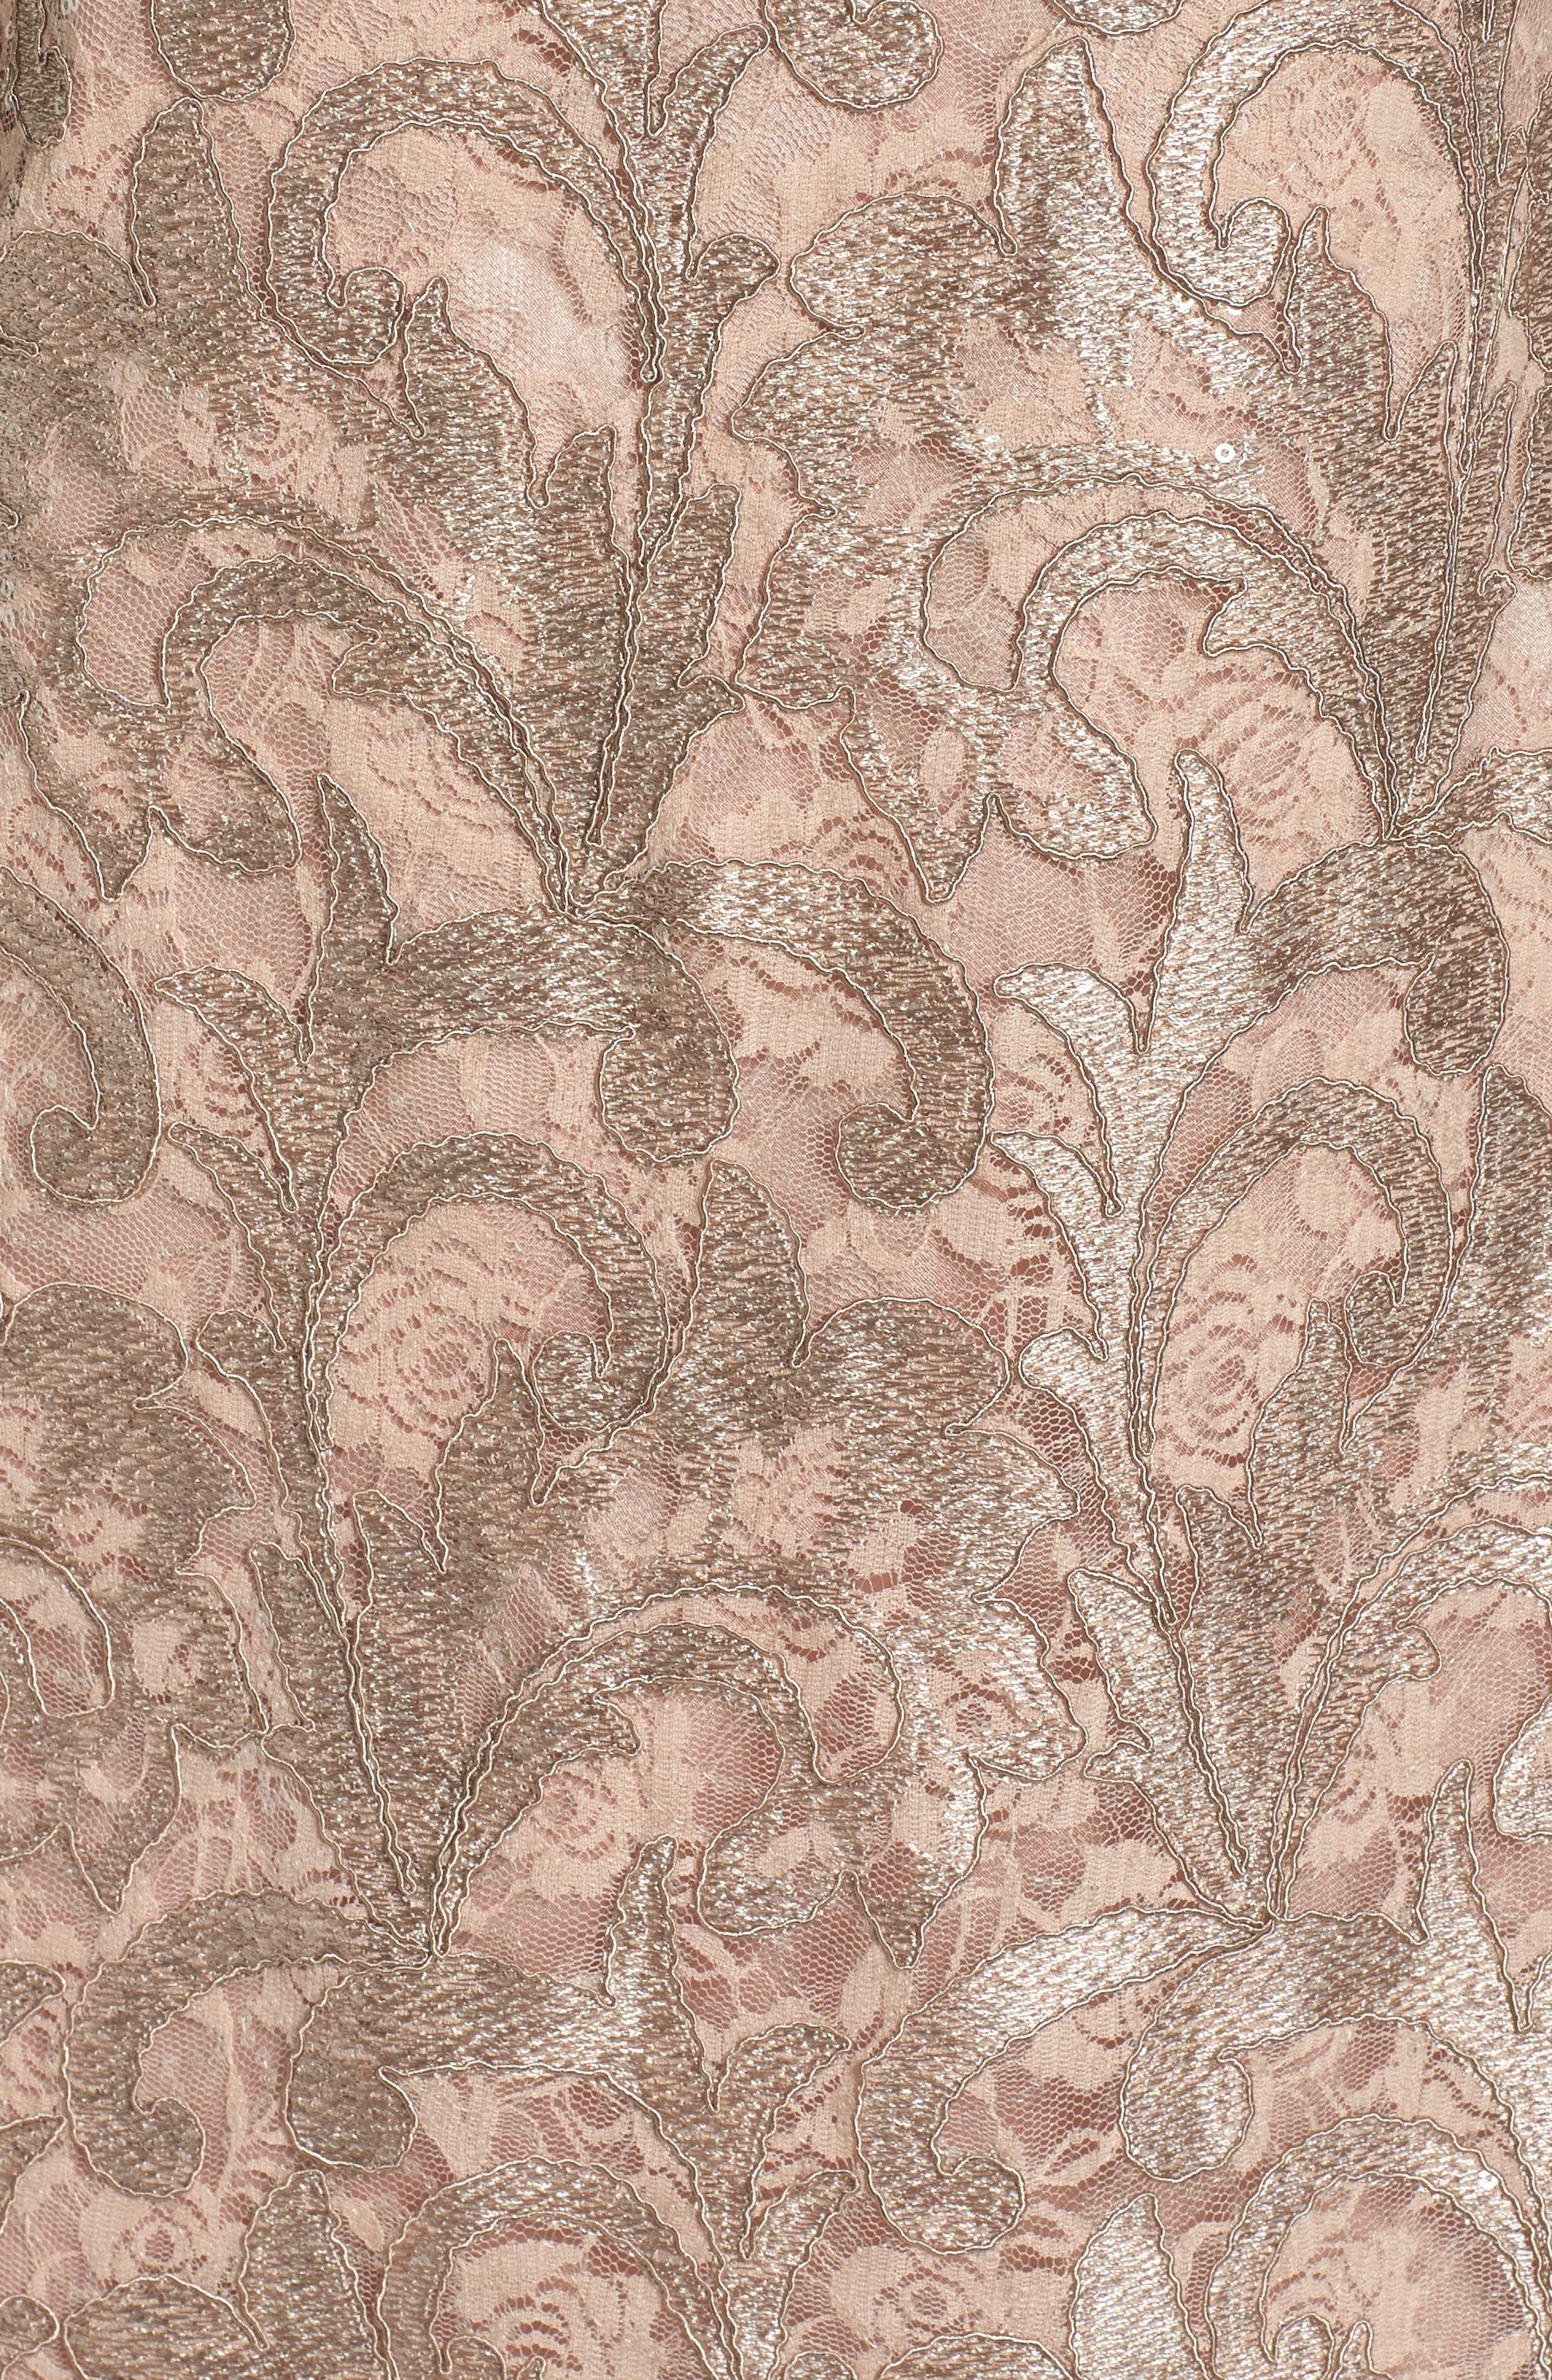 Lace Shift Dress,                             Alternate thumbnail 5, color,